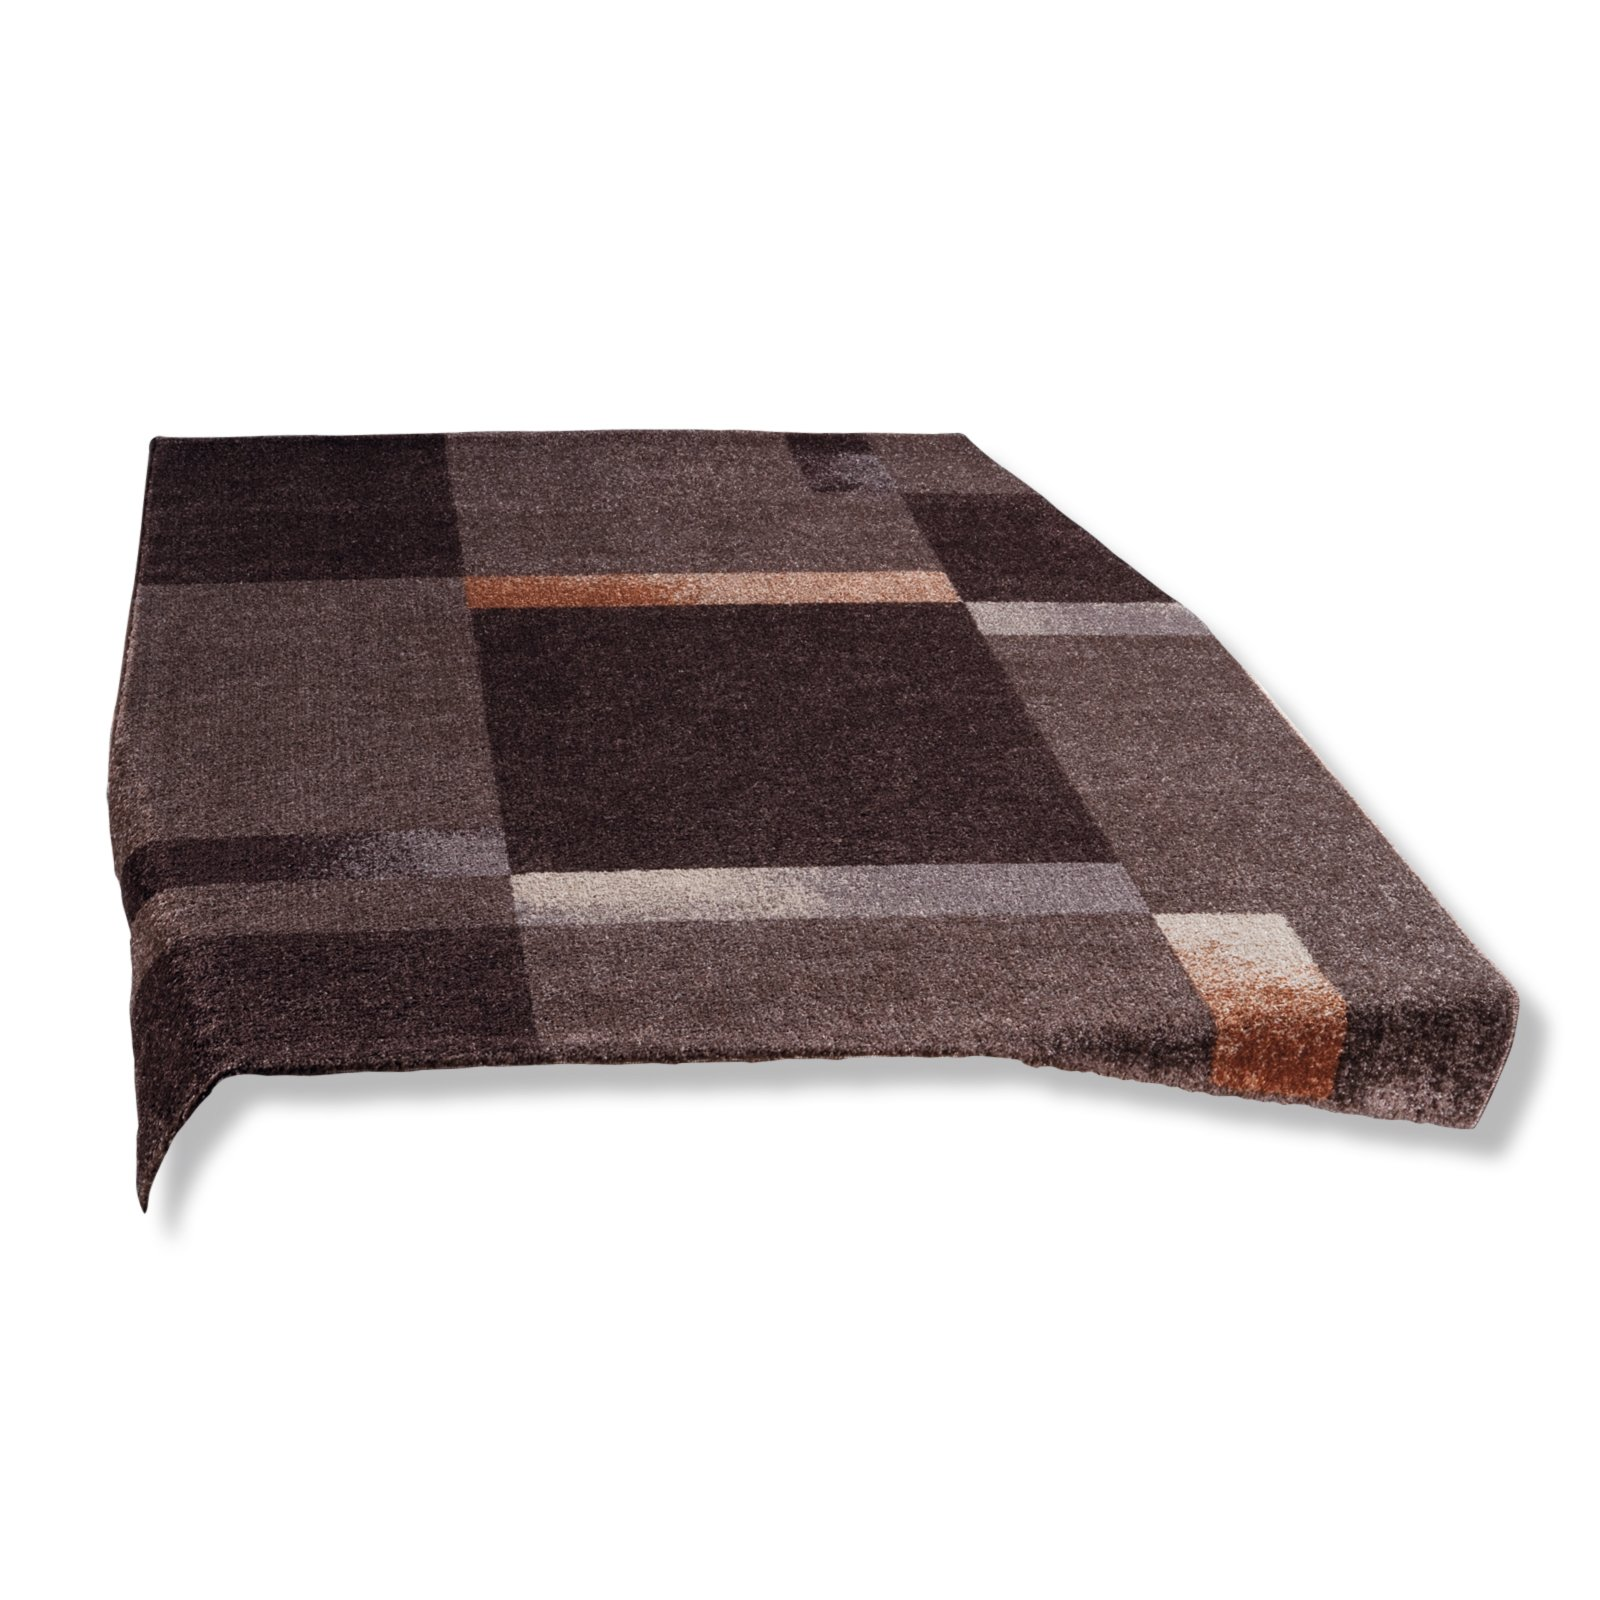 br cke vera braun 80x150 cm gemusterte teppiche. Black Bedroom Furniture Sets. Home Design Ideas